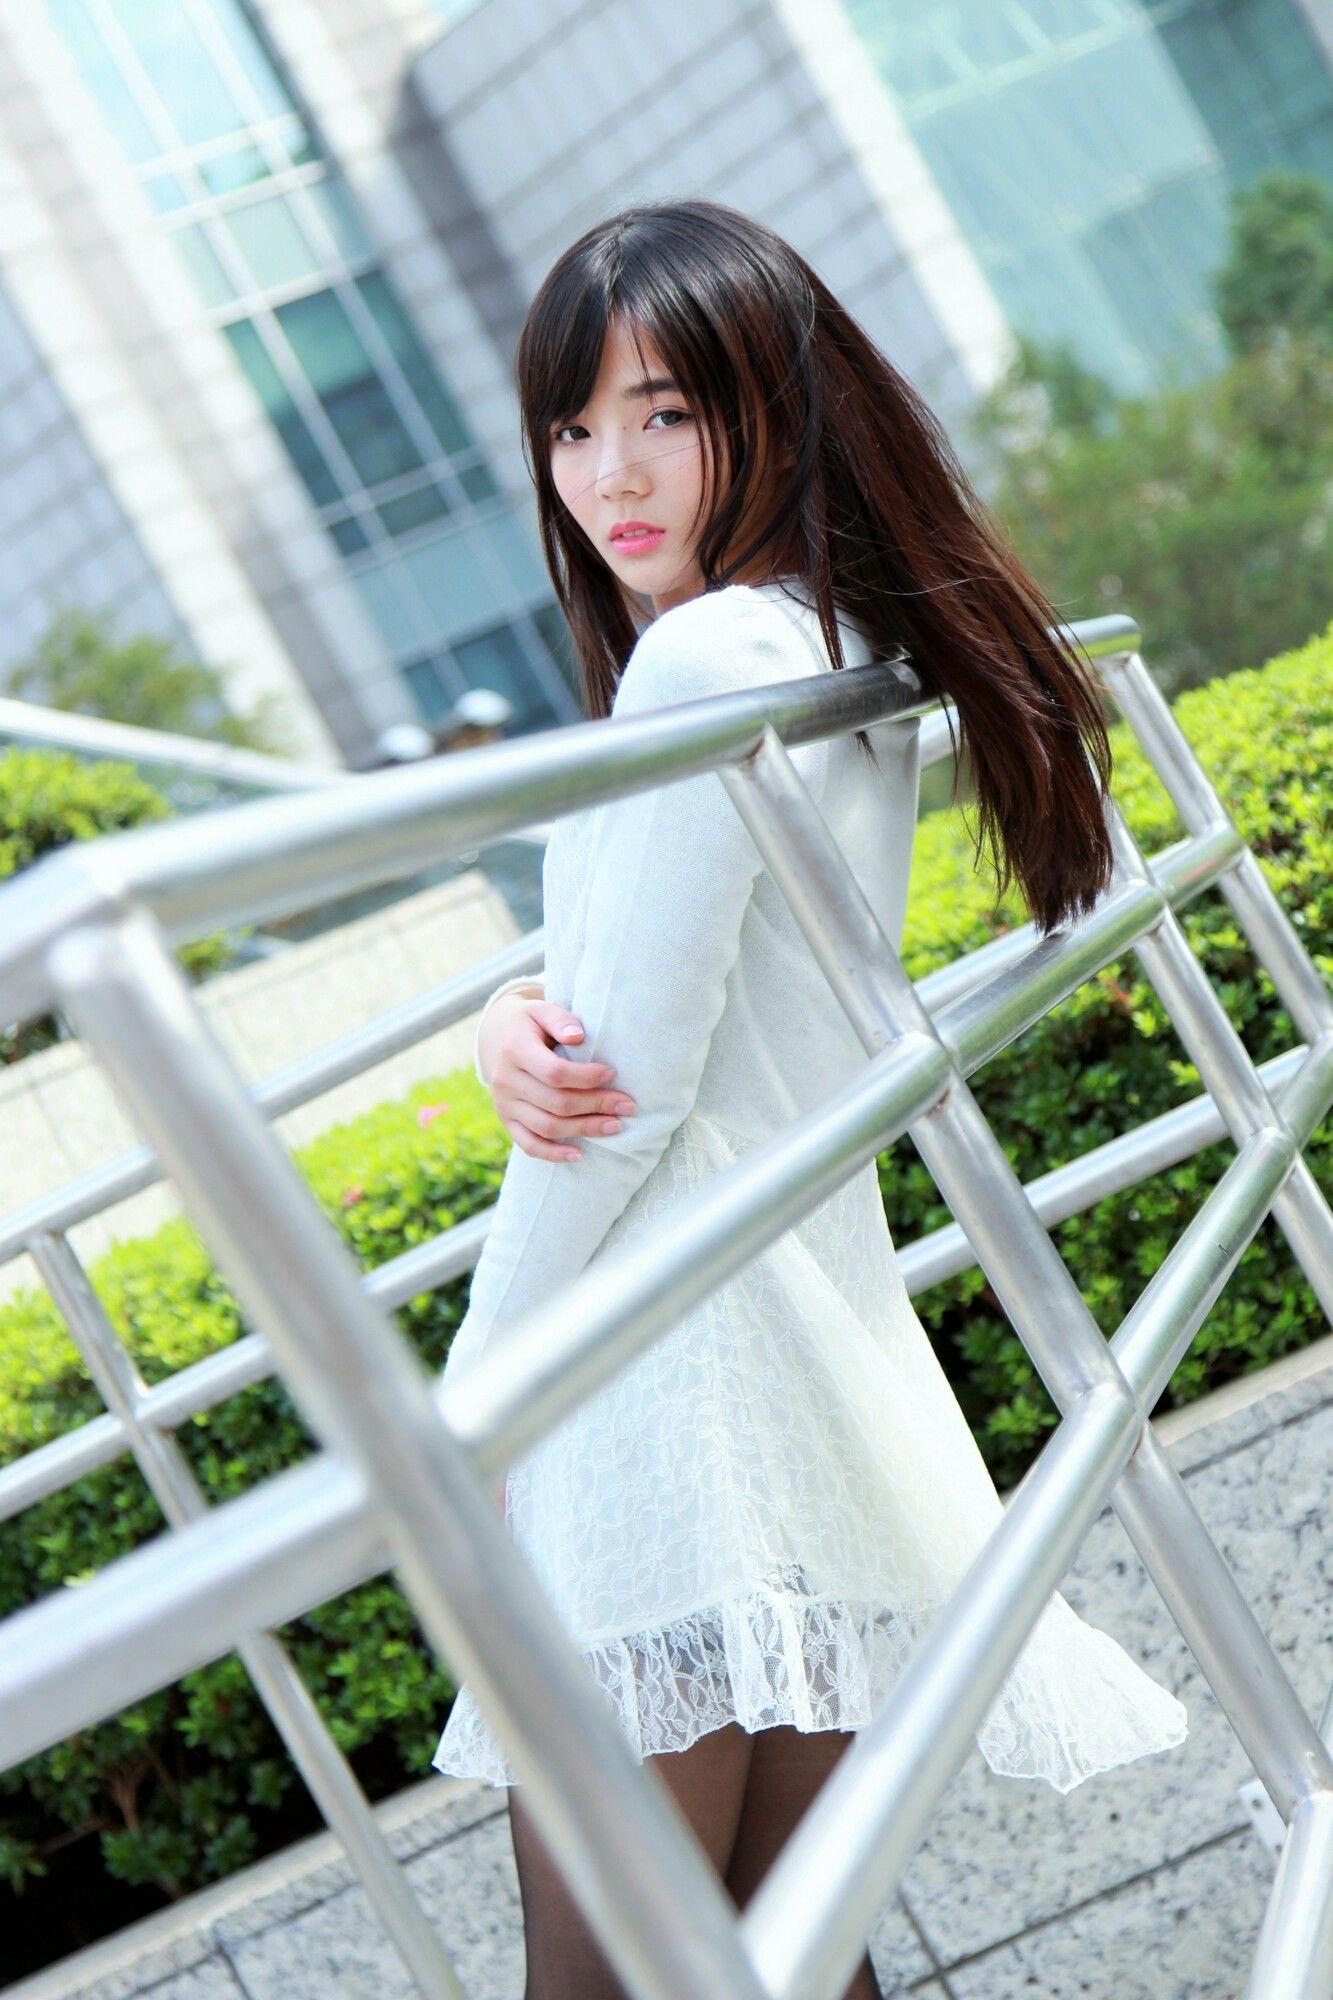 VOL.1015 [台湾正妹]可爱清纯正妹萌女软妹:芋圓超高清个人性感漂亮大图(62P)